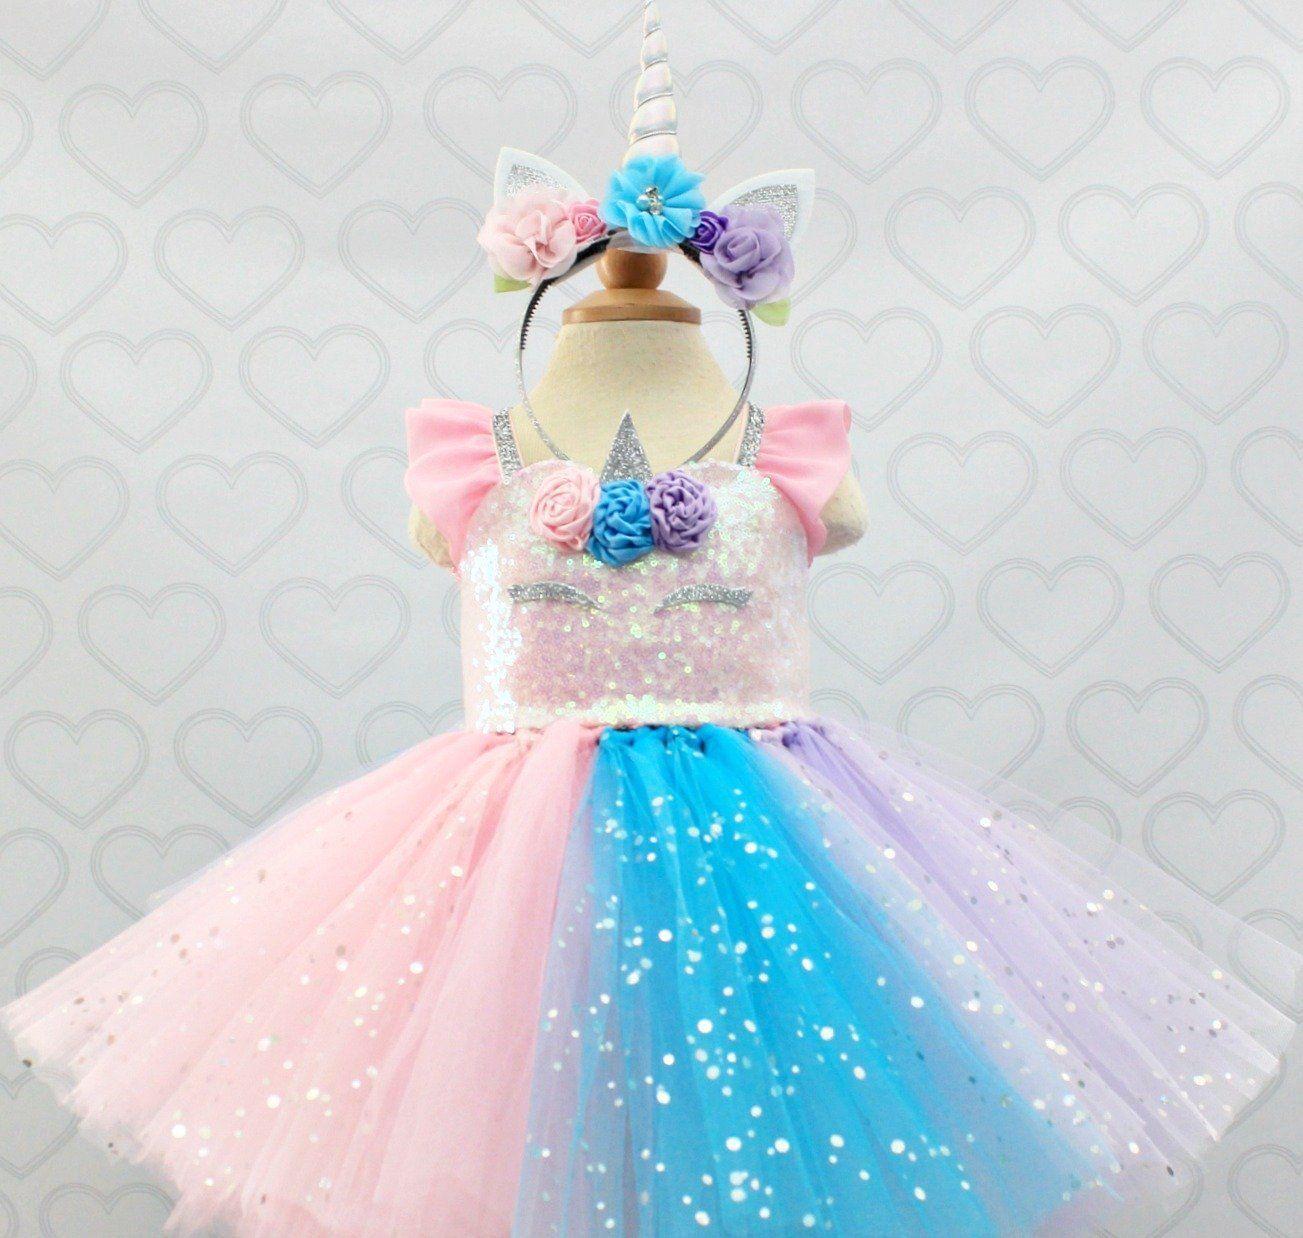 ea1d2923e6551 Unicorn dress-unicorn tutu dress-unicorn birthday dress-unicorn tutu ...